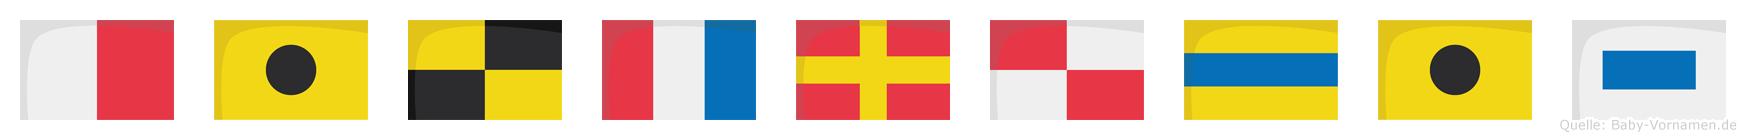 Hiltrudis im Flaggenalphabet